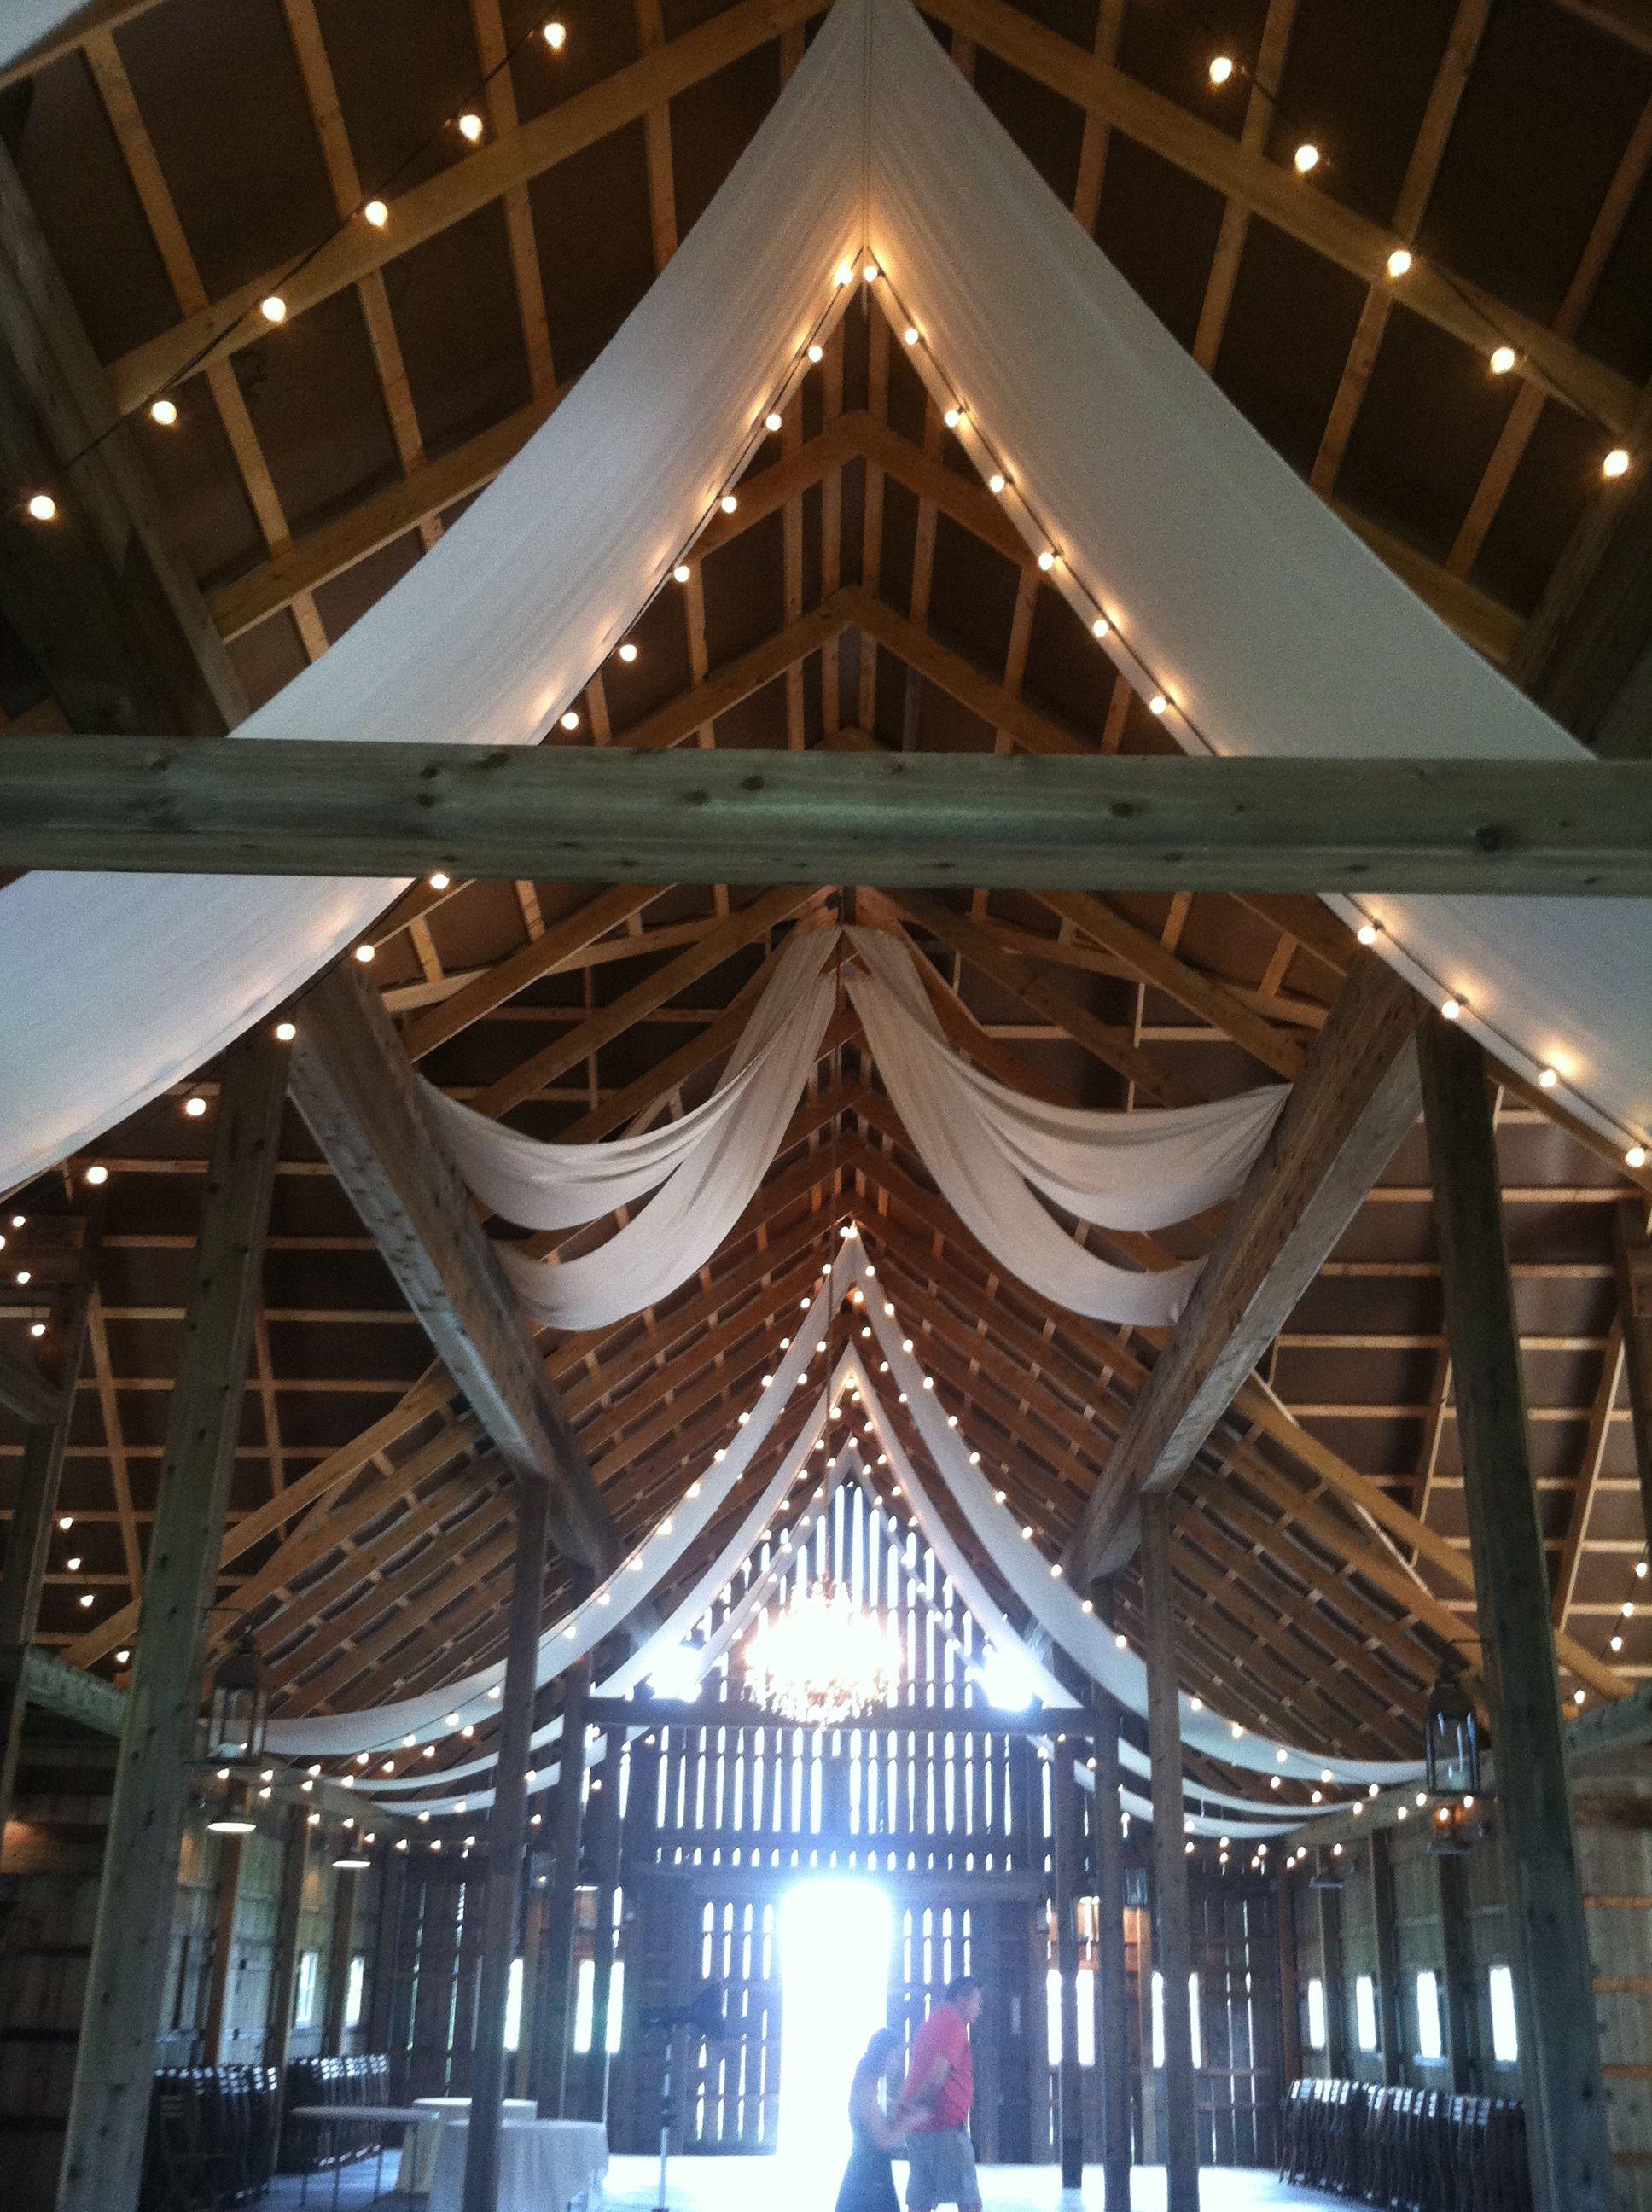 Indiana hendricks county lizton - The Barn At Kennedy Farm Wedding Barn Drapery Lizton Indiana Wedding Venue